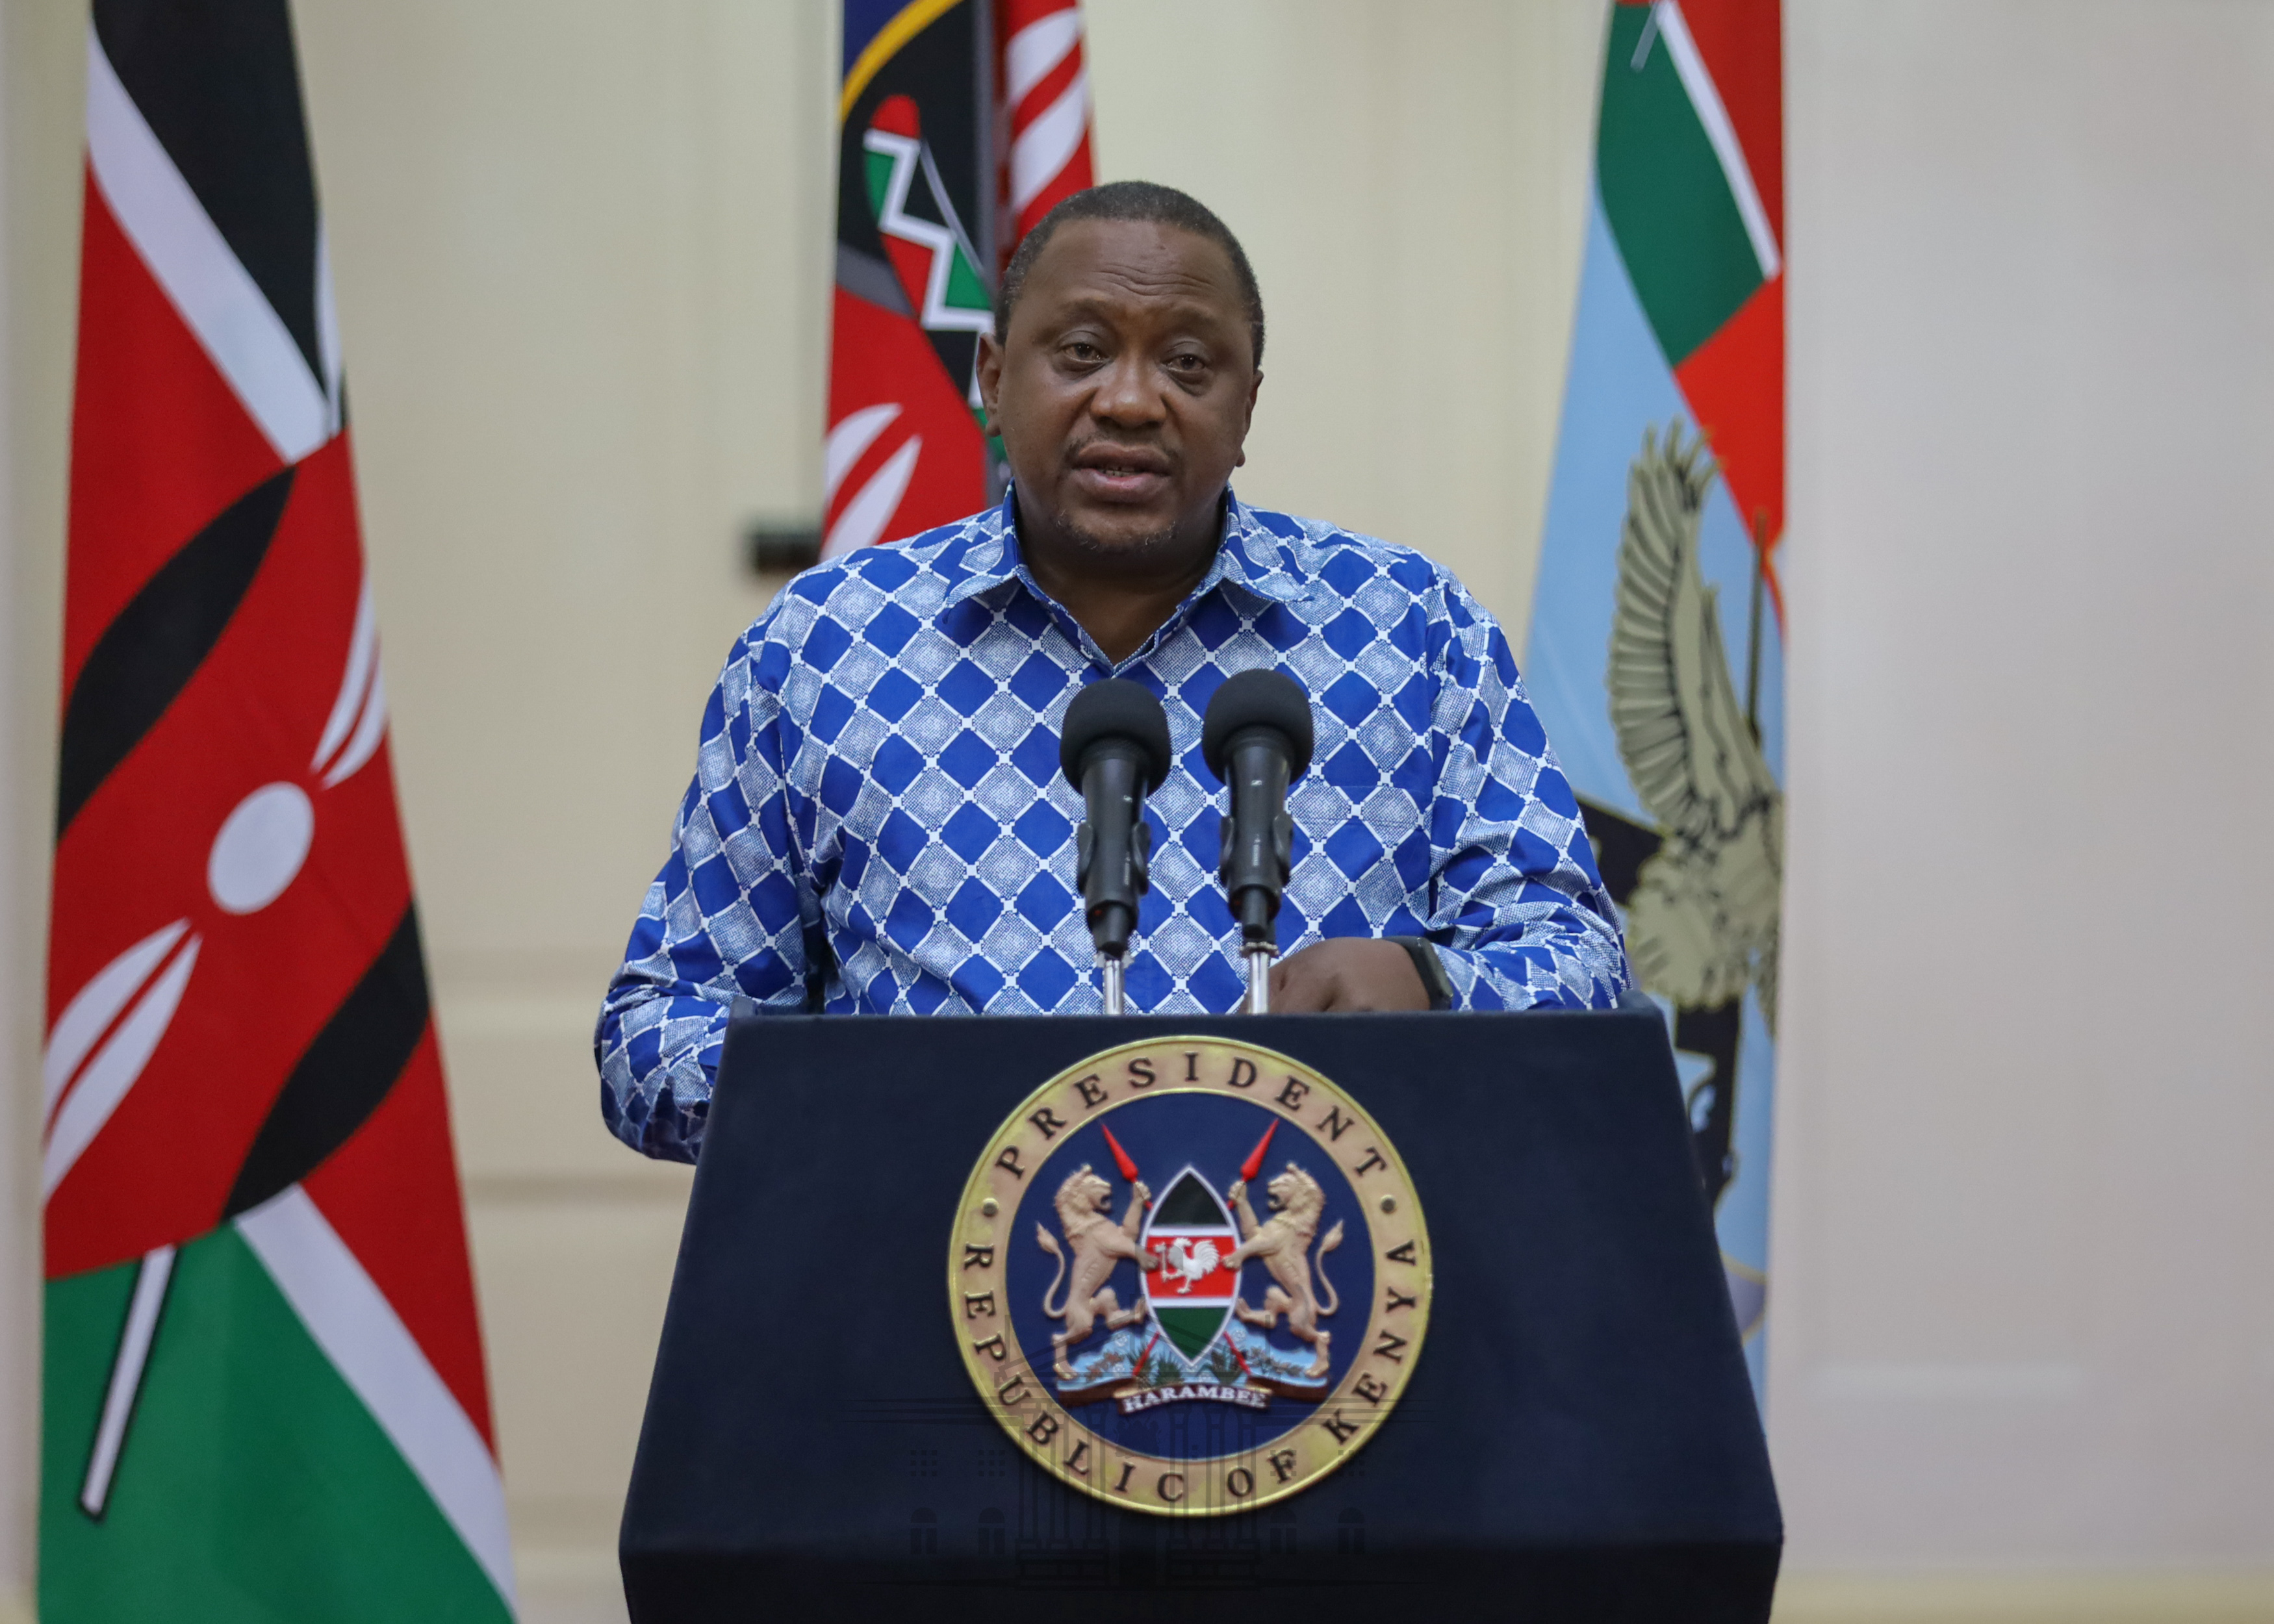 President Uhuru Kenyatta addressing the nation regarding new measures by the government